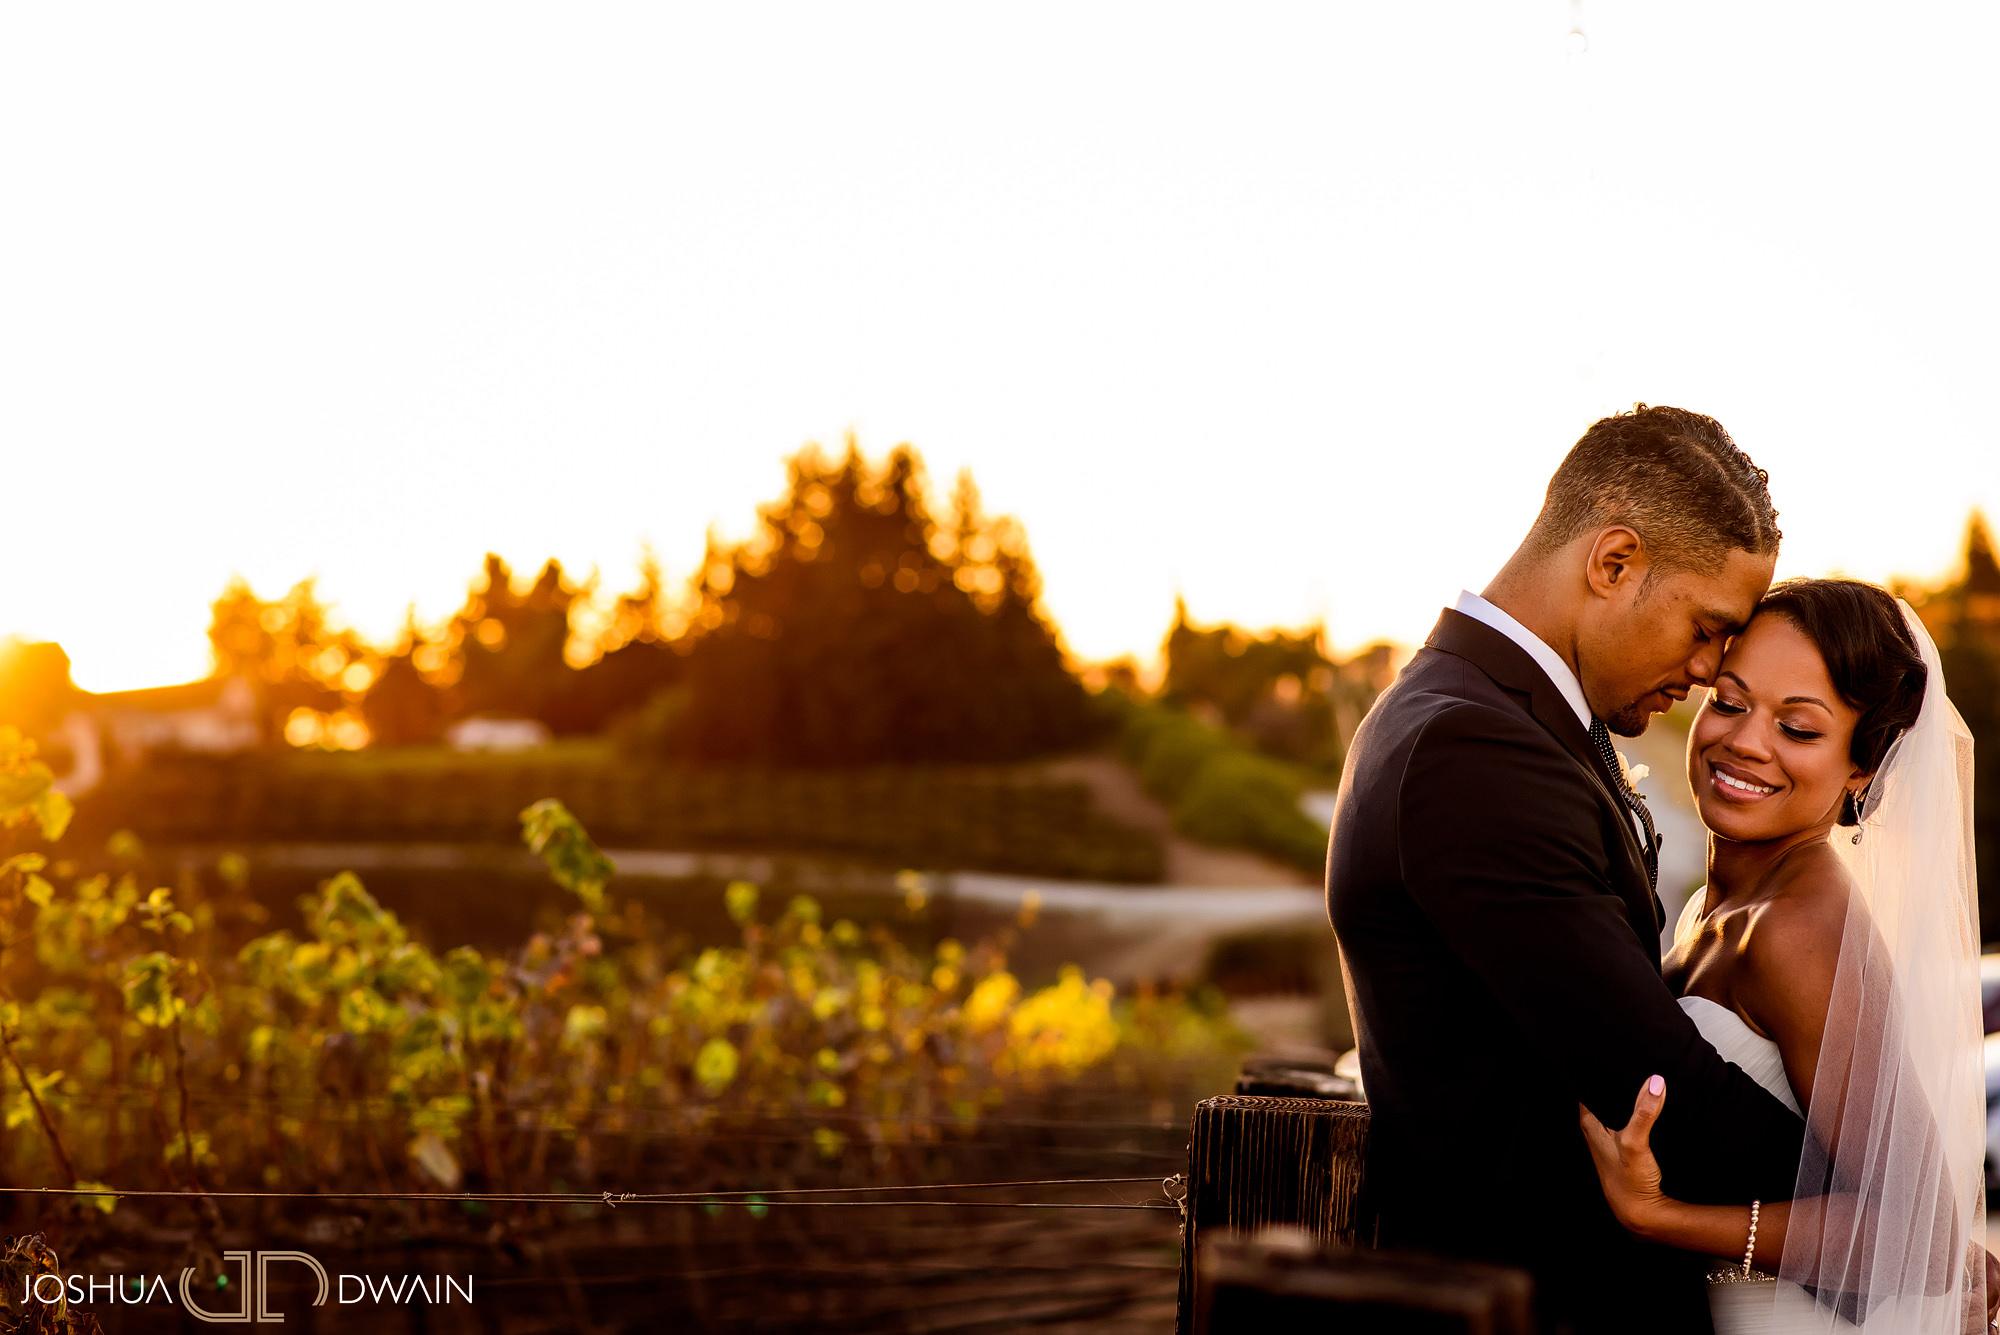 joshua-dwain-weddings-gallery-best-wedding-photographers-us-006